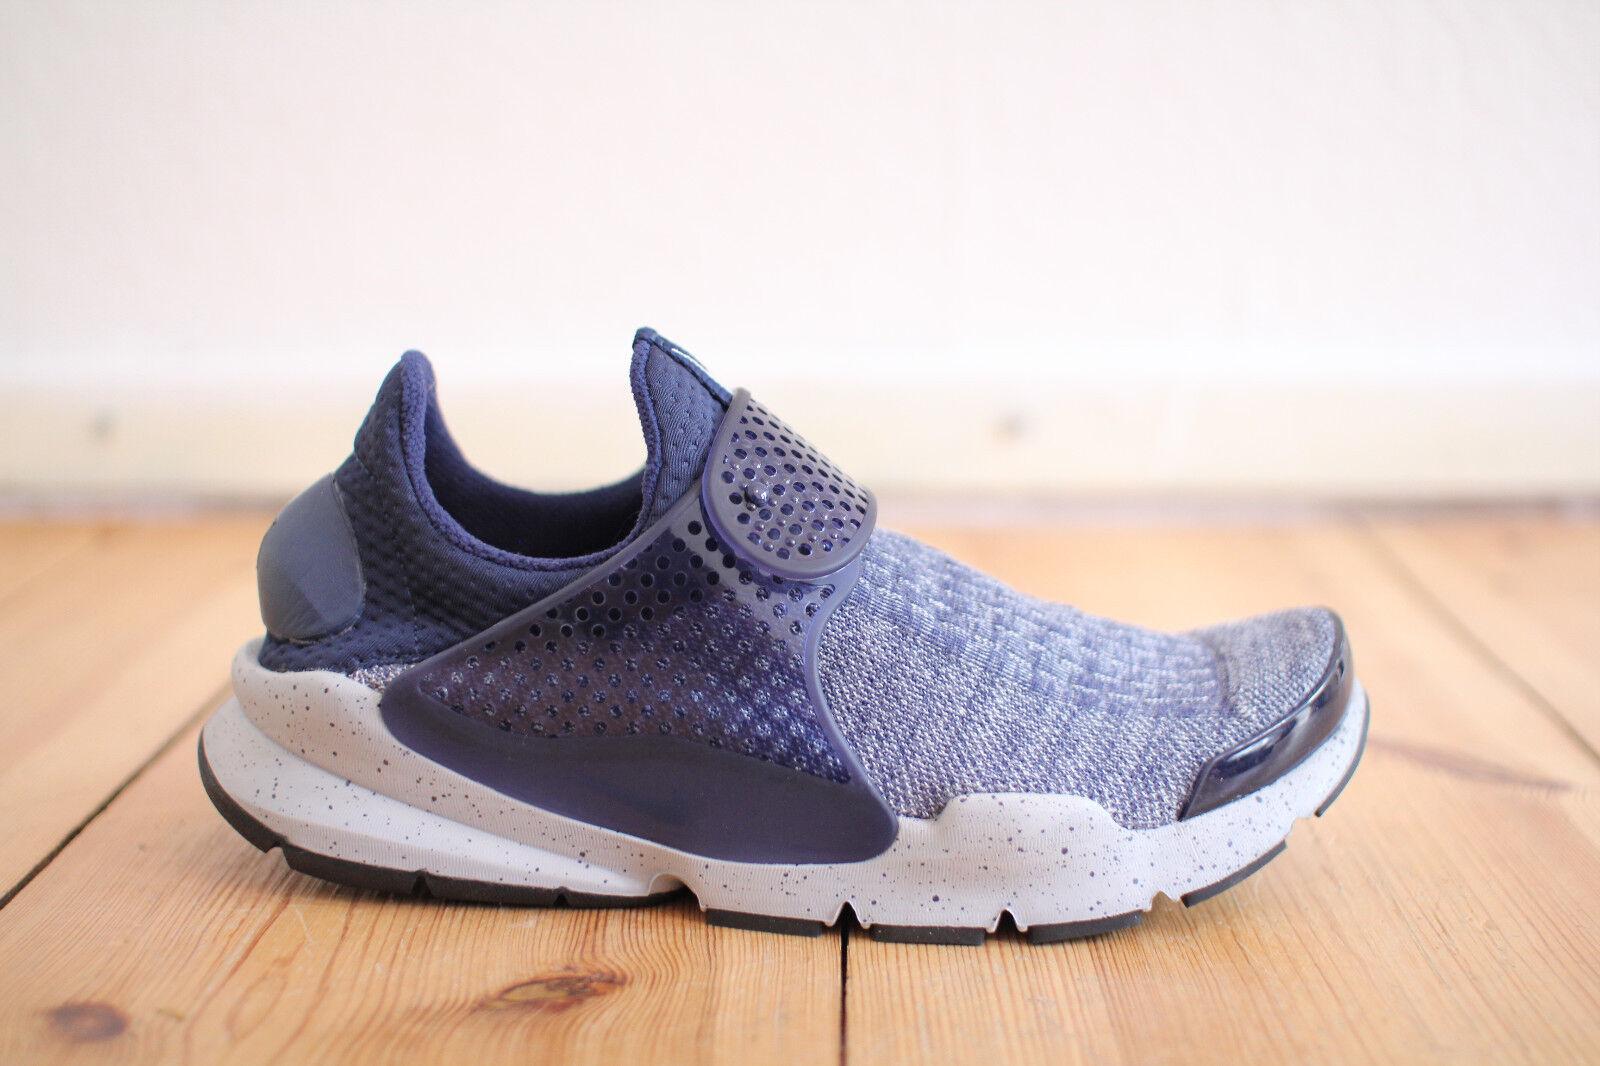 Nike Sock Dart SE Premium Blau Oreo Gr. 42,43,44,45 NEU & OVP